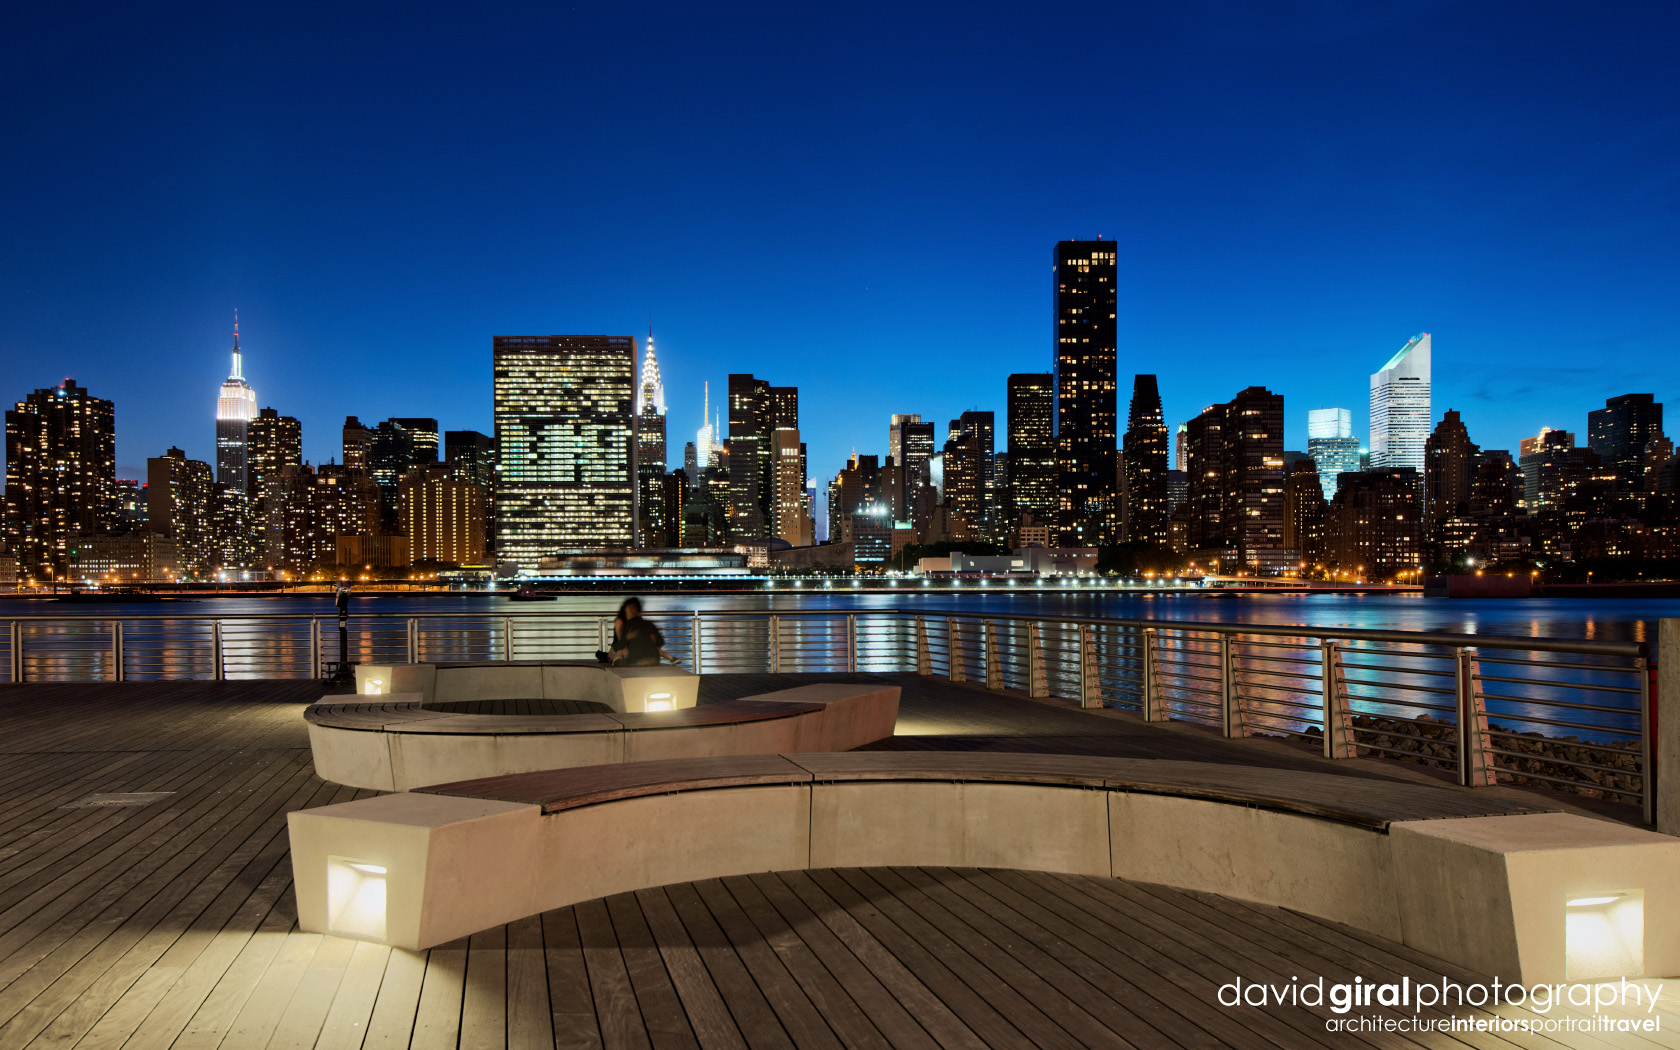 10-dgiral-gantry-park-long-island-queens-nyc-skyline-night